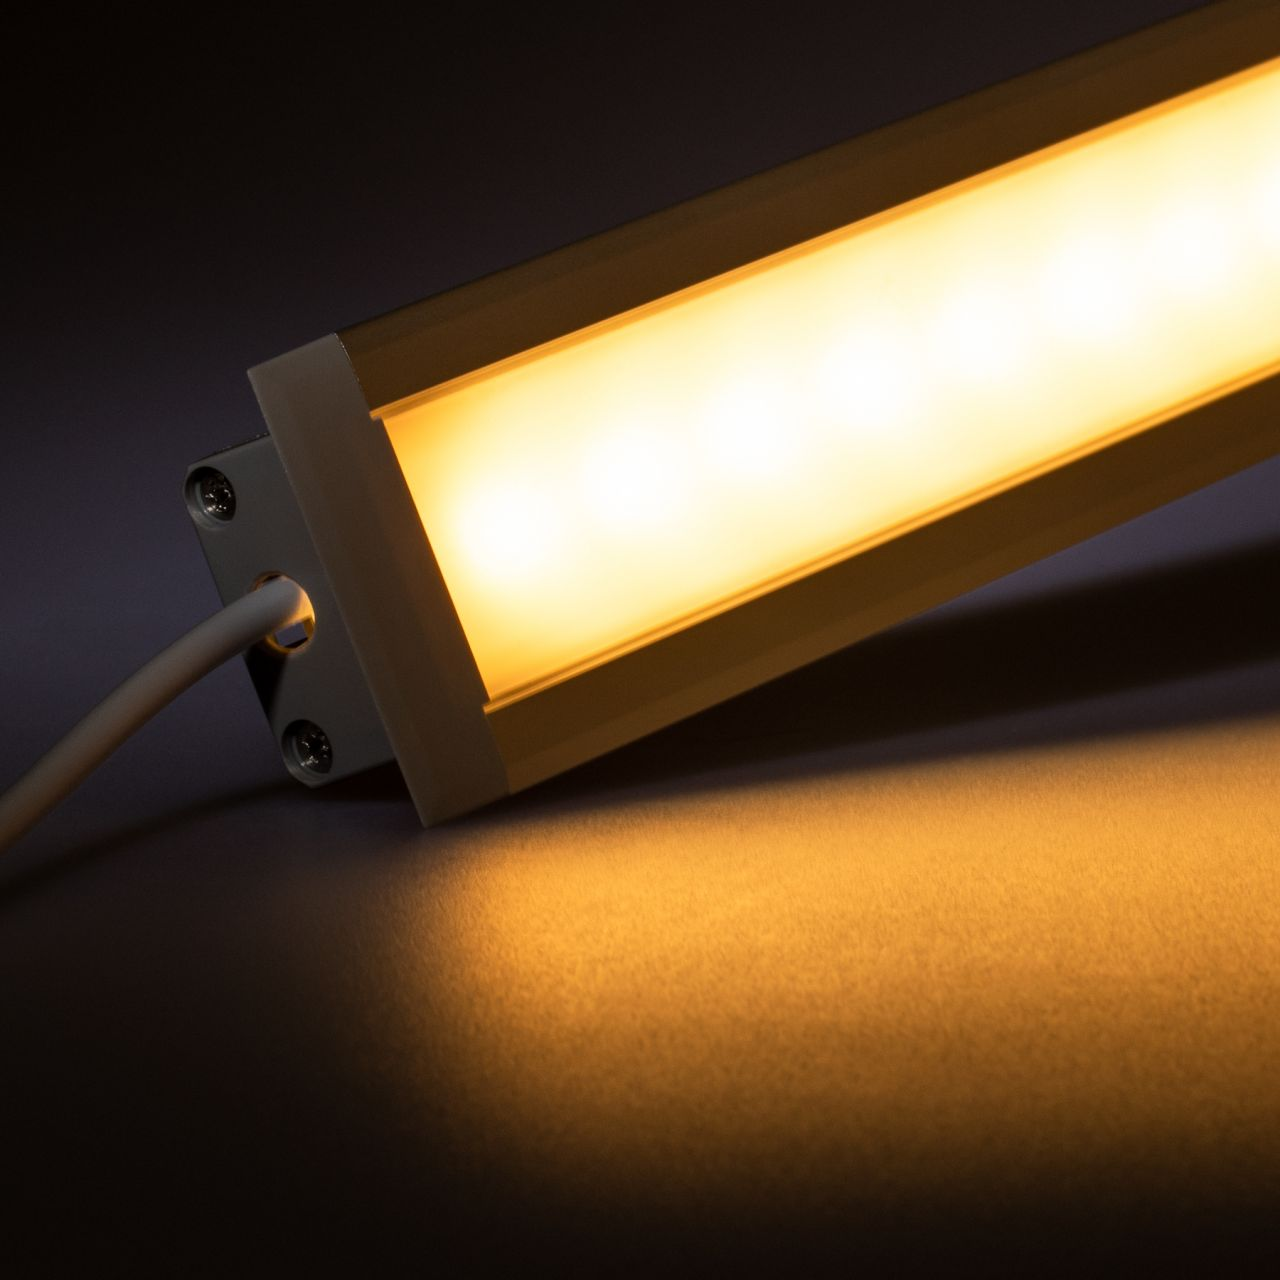 12V Aluminium Einbau LED Leiste – High Power - warmweiß – diffuse Abdeckung